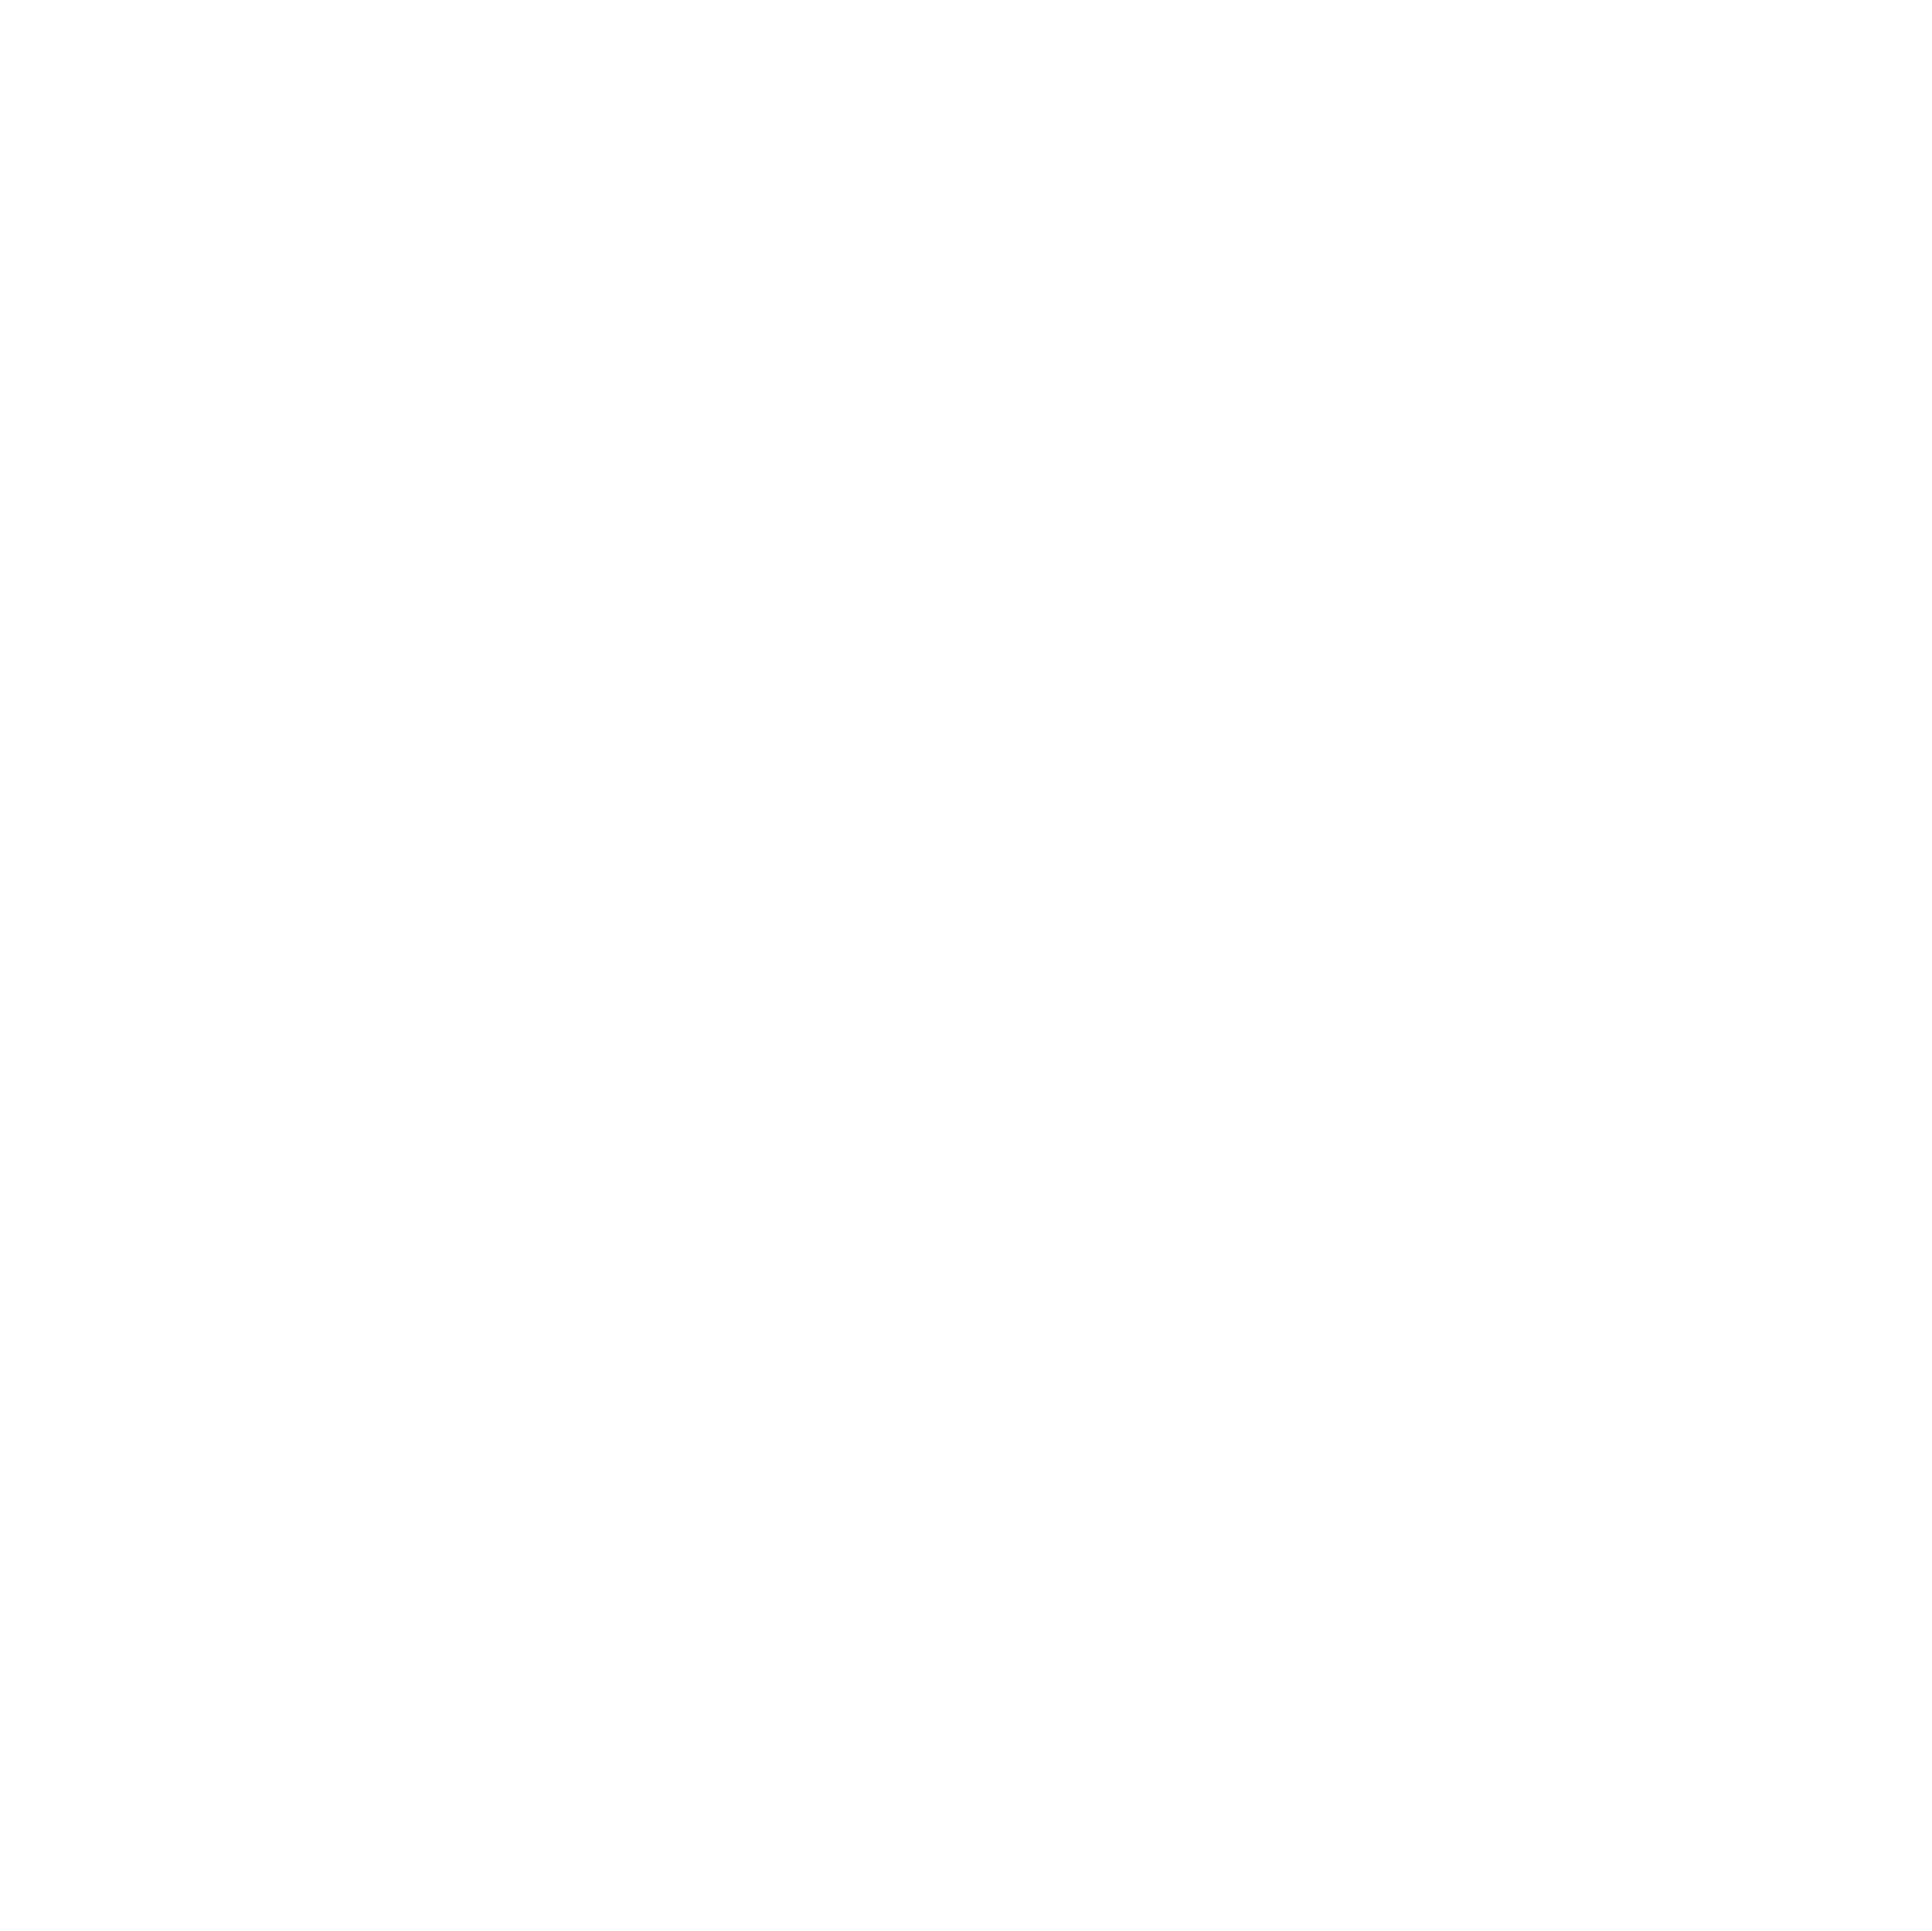 FACTORHY Avocats